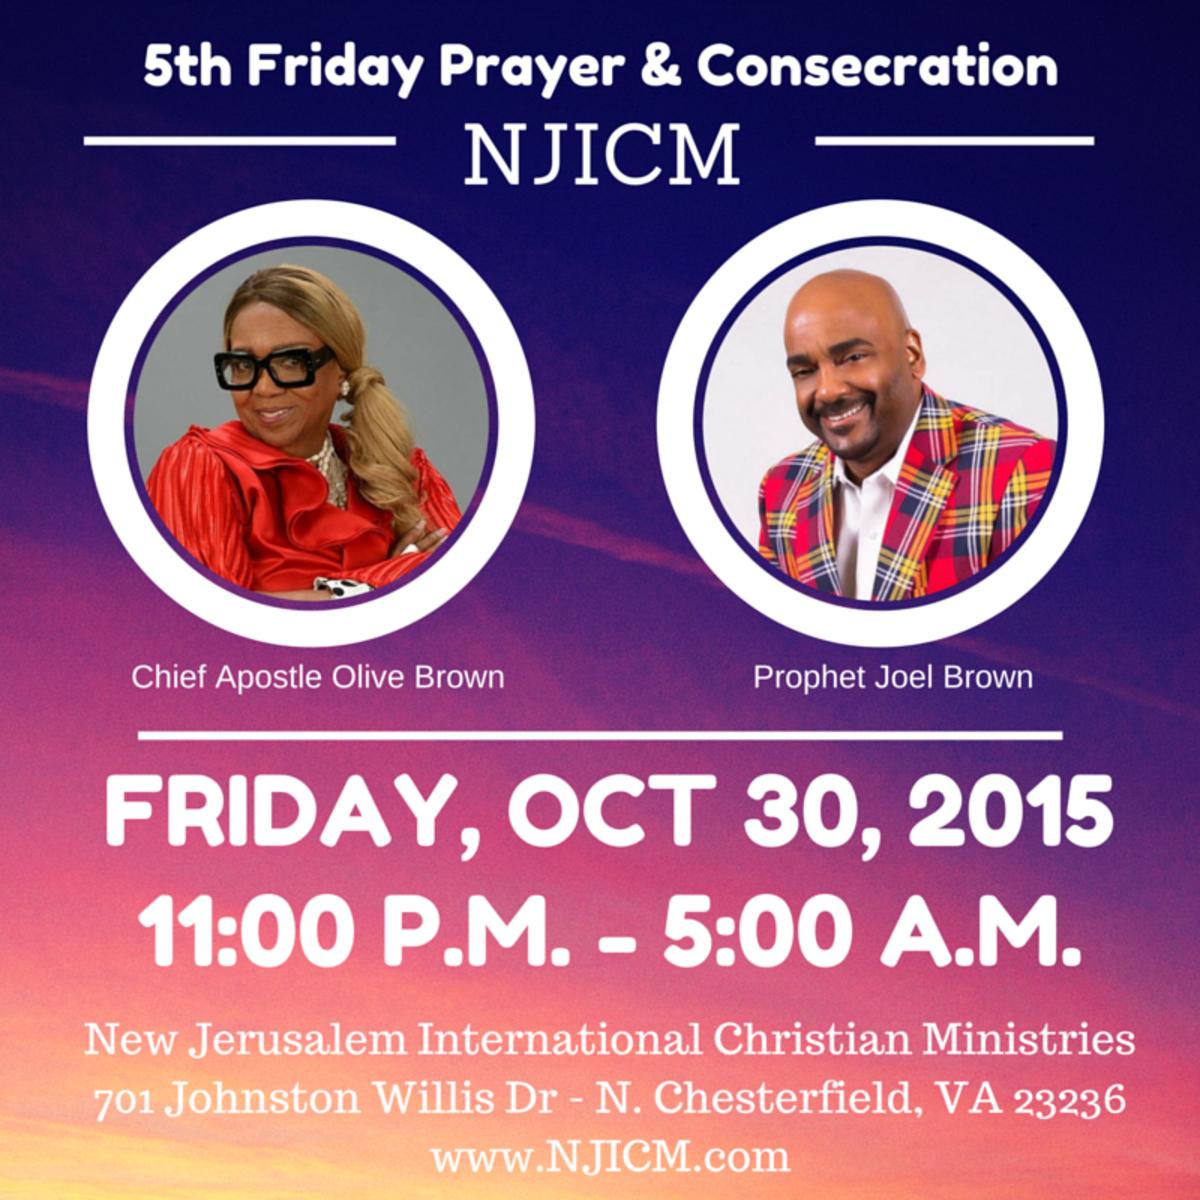 5th Friday Prayer